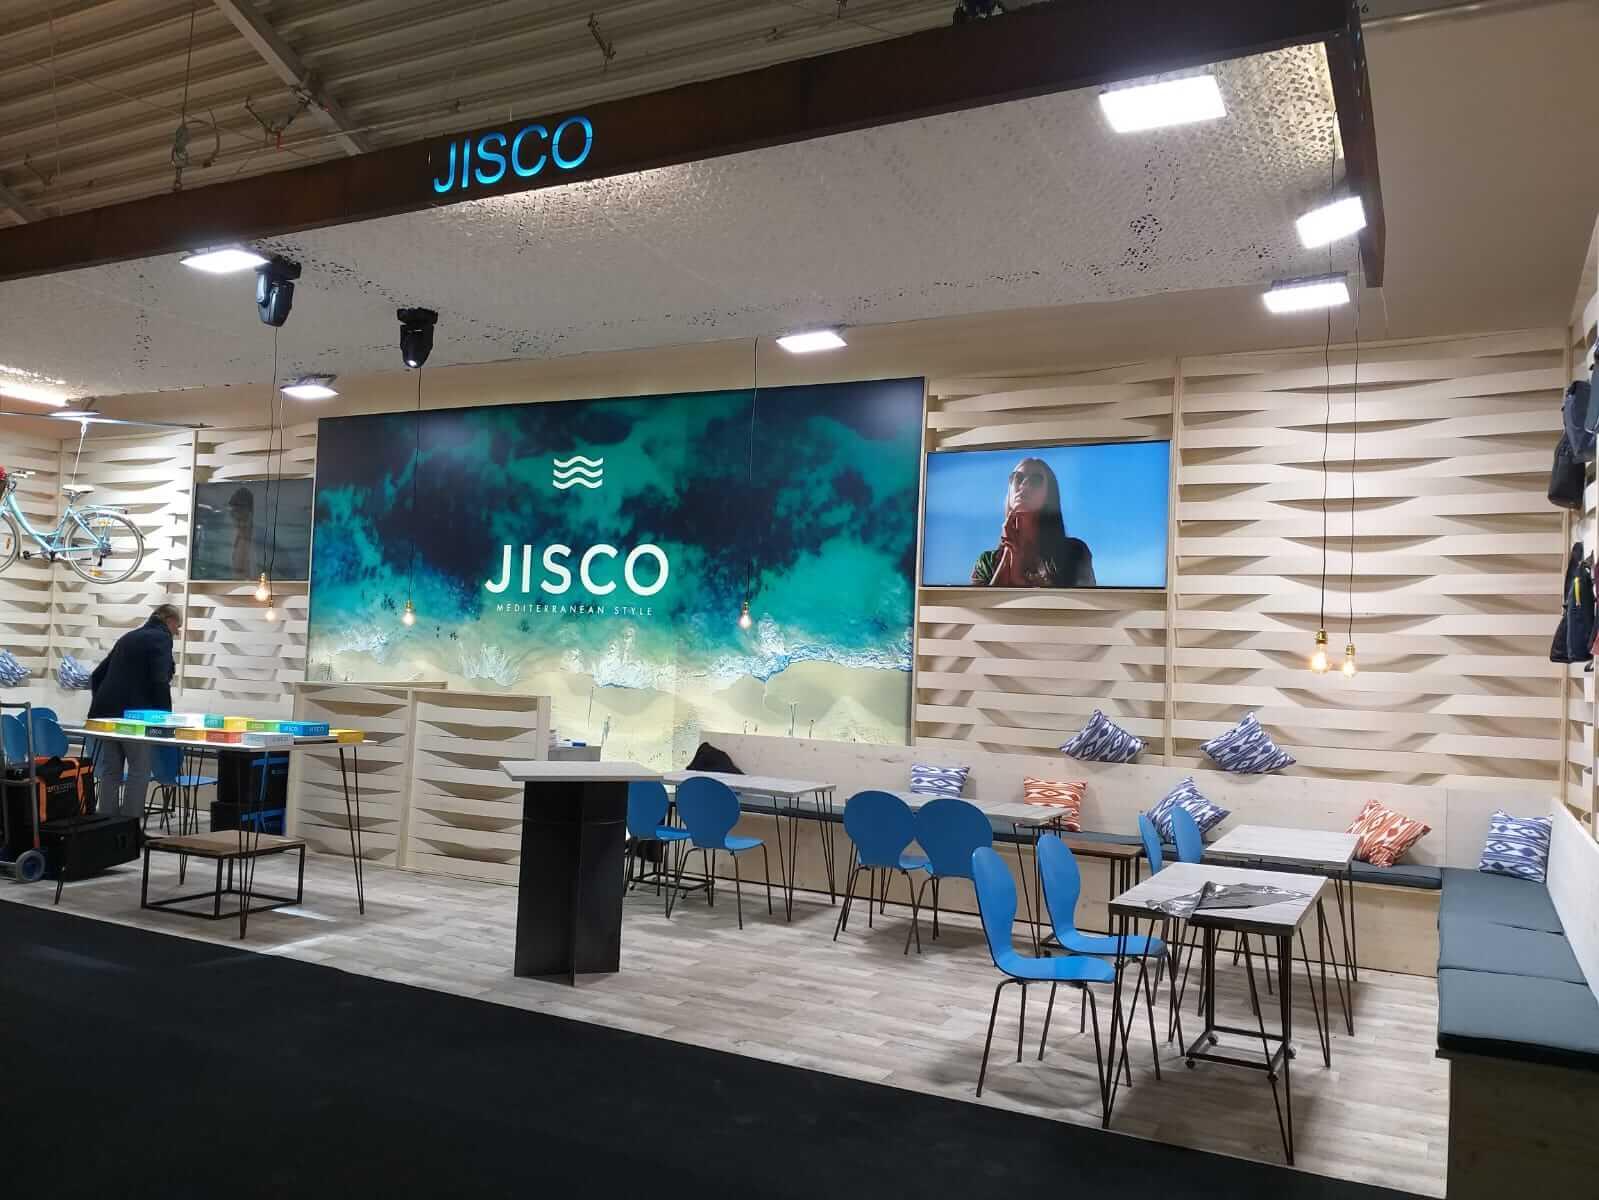 Stand de Jisco en Opti 2019